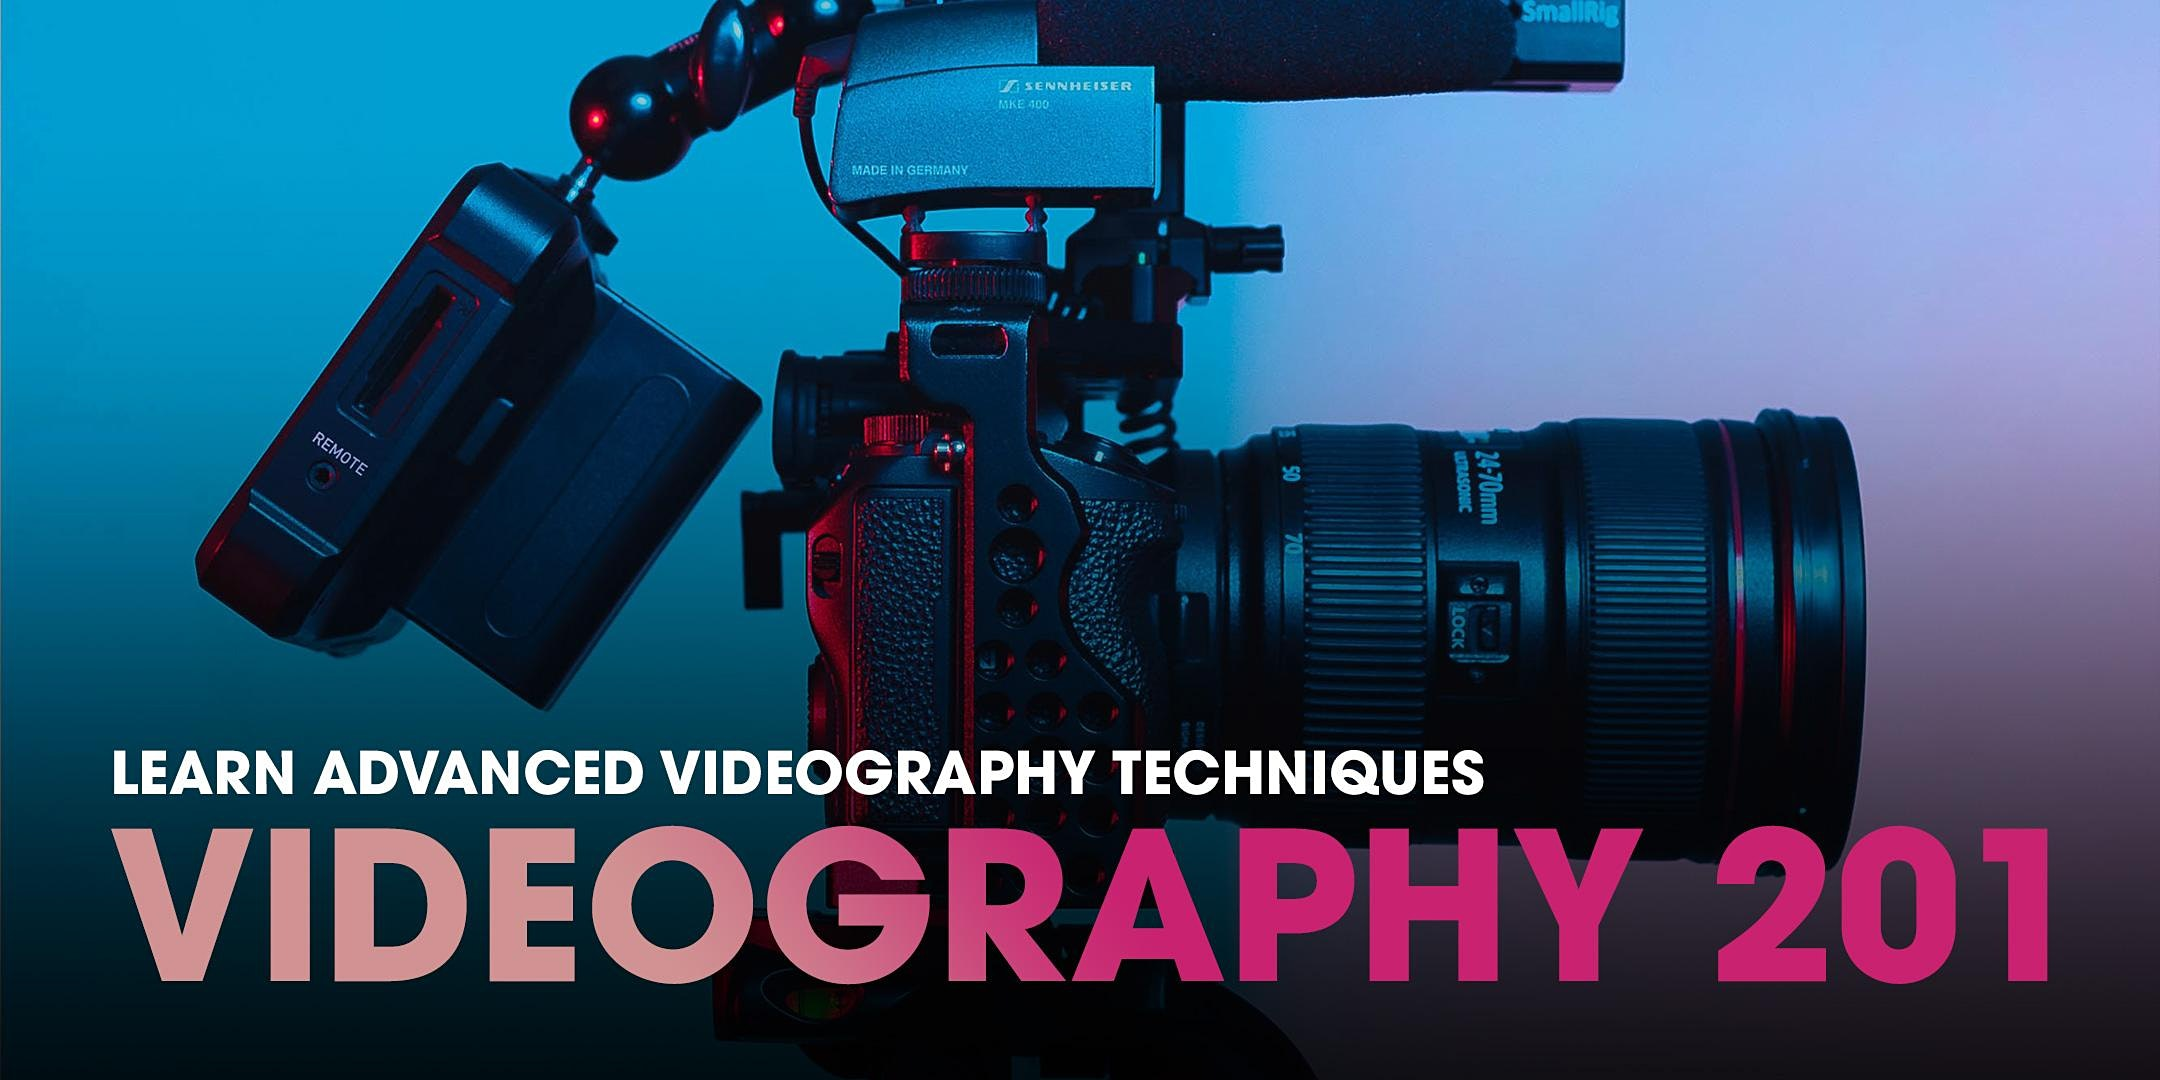 Videography 201